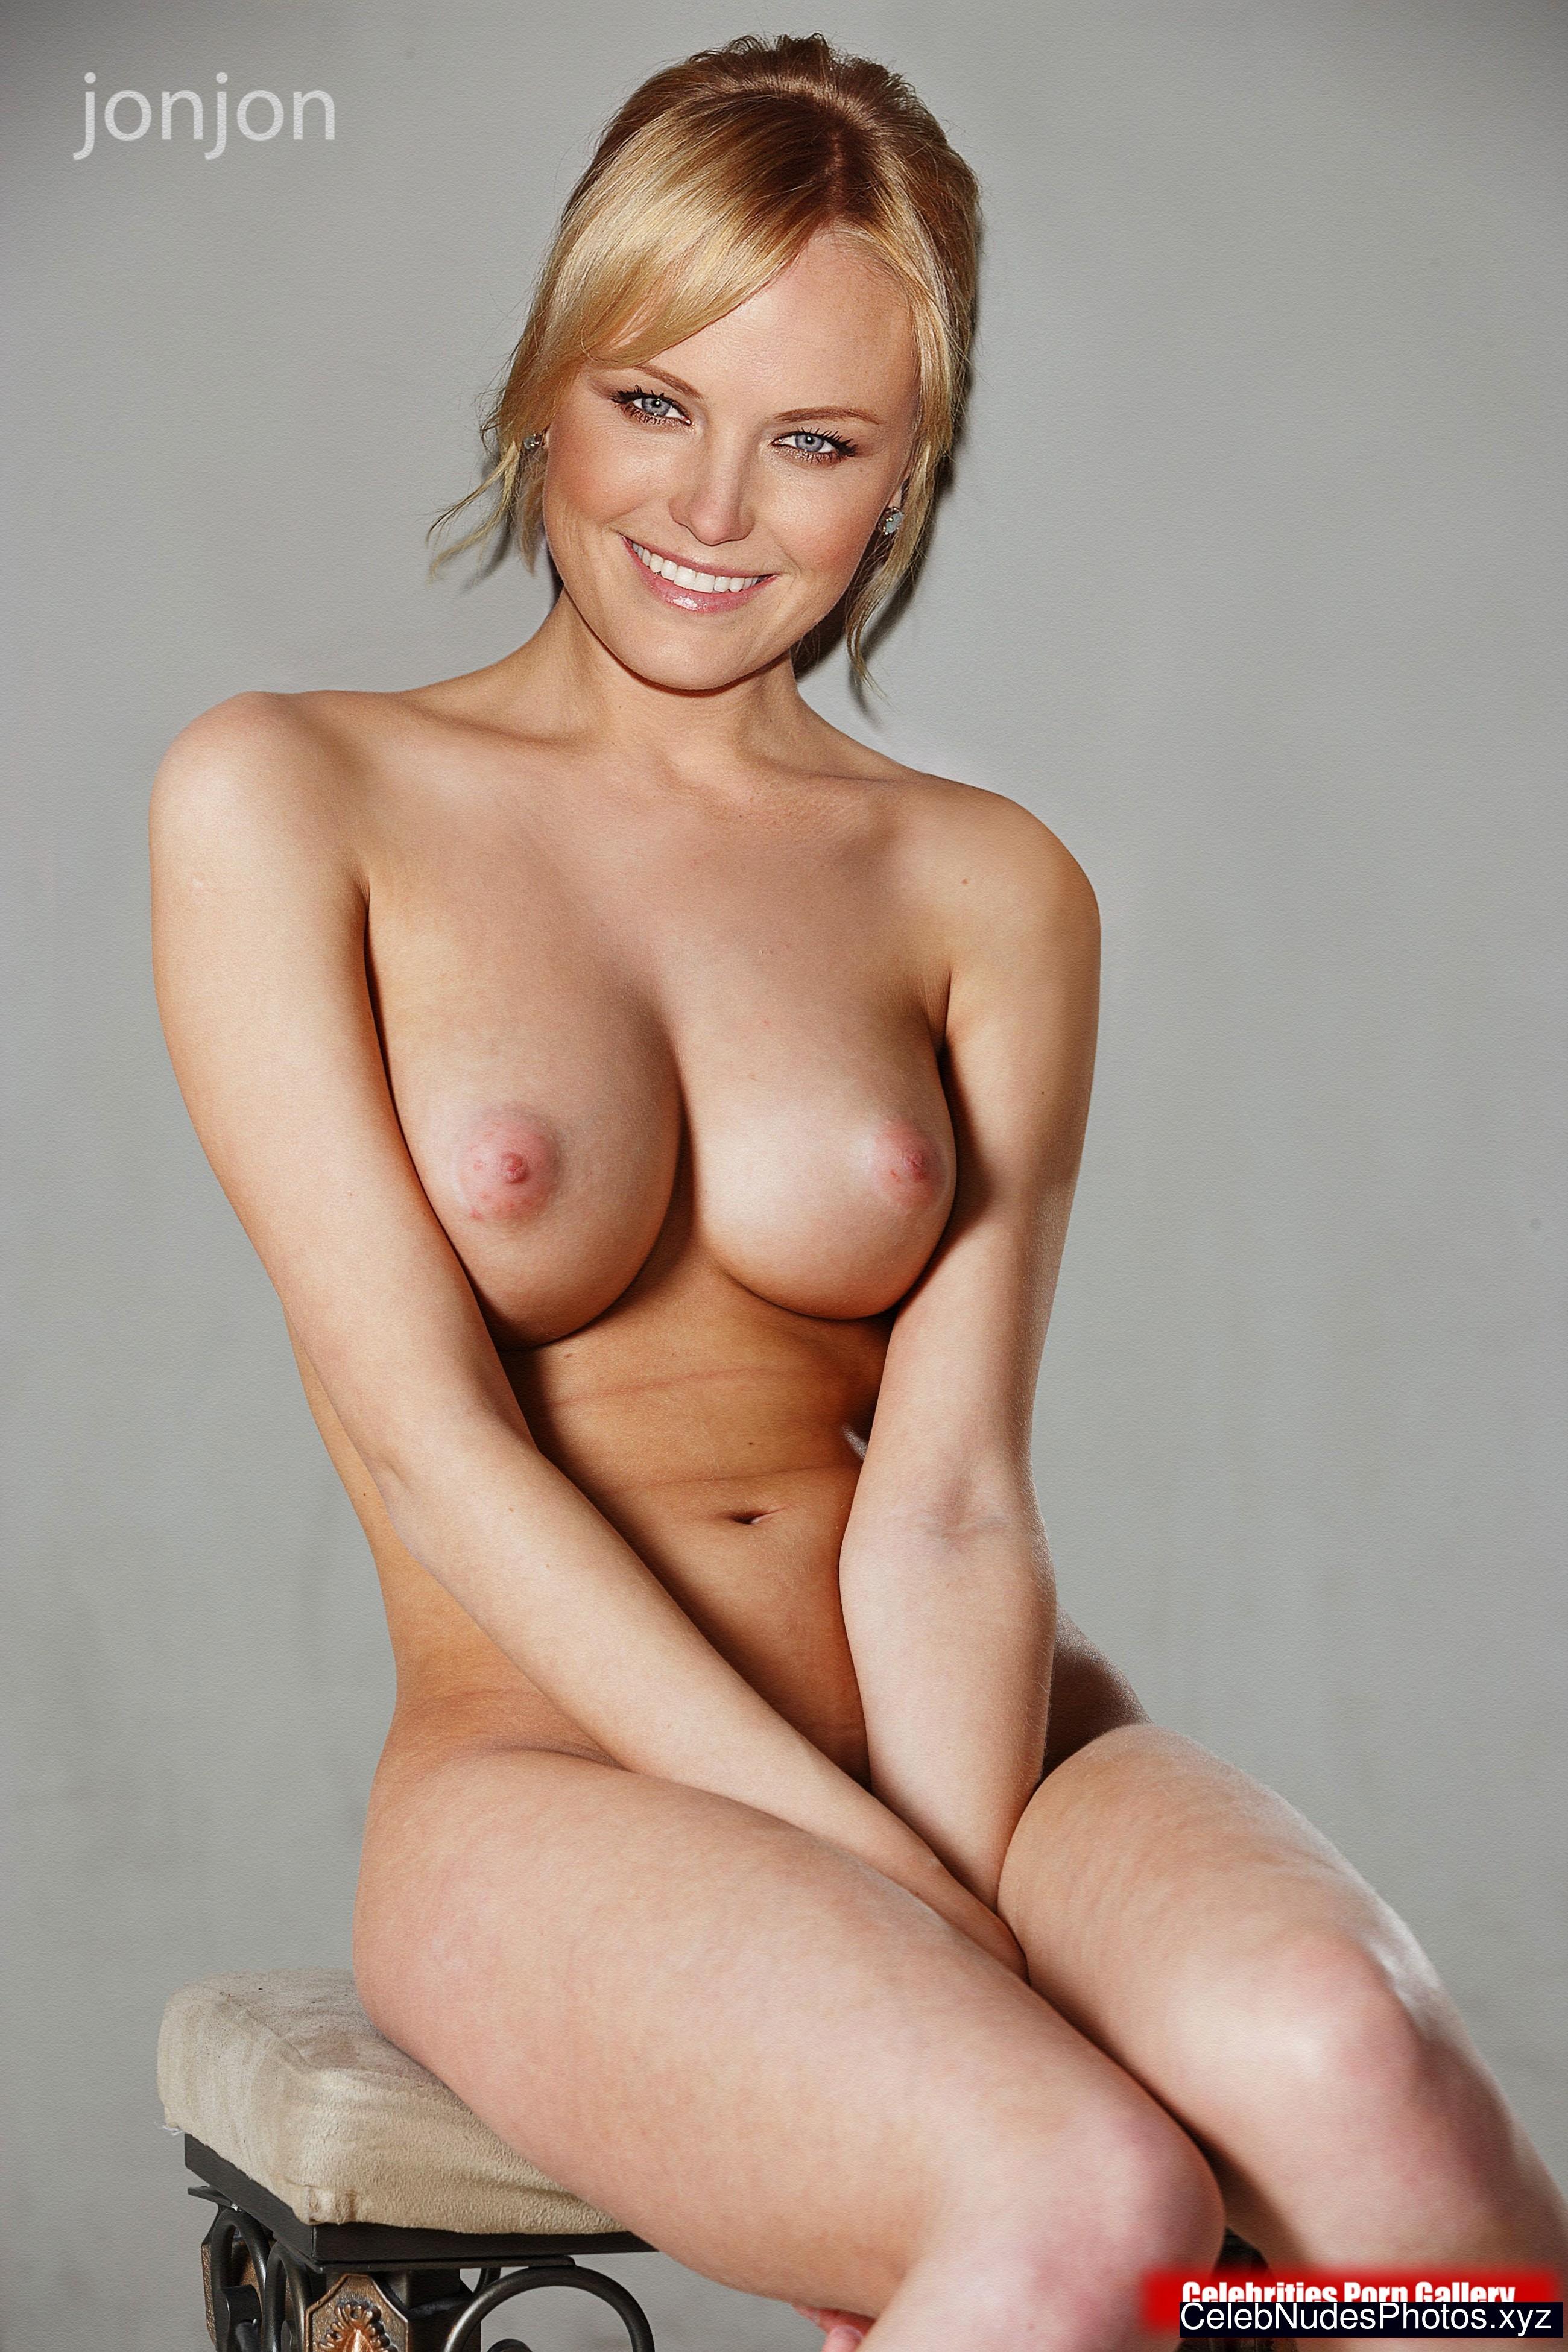 malin akerman nakd fakes